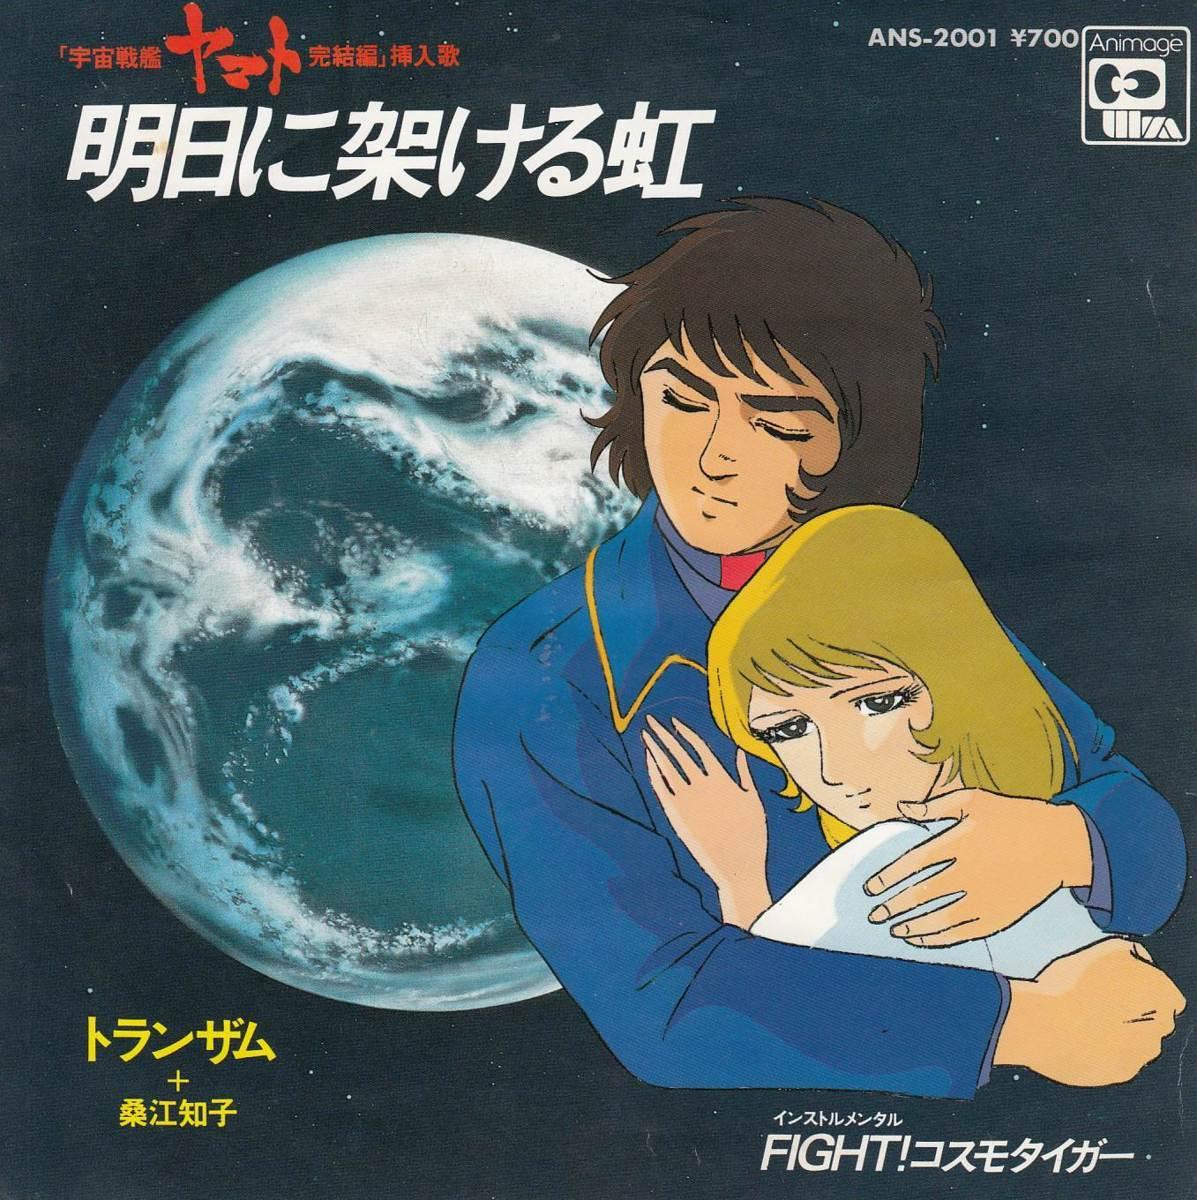 E09250-【EP】トランザム 桑江知子 宇宙戦艦ヤマト 挿入歌_画像1